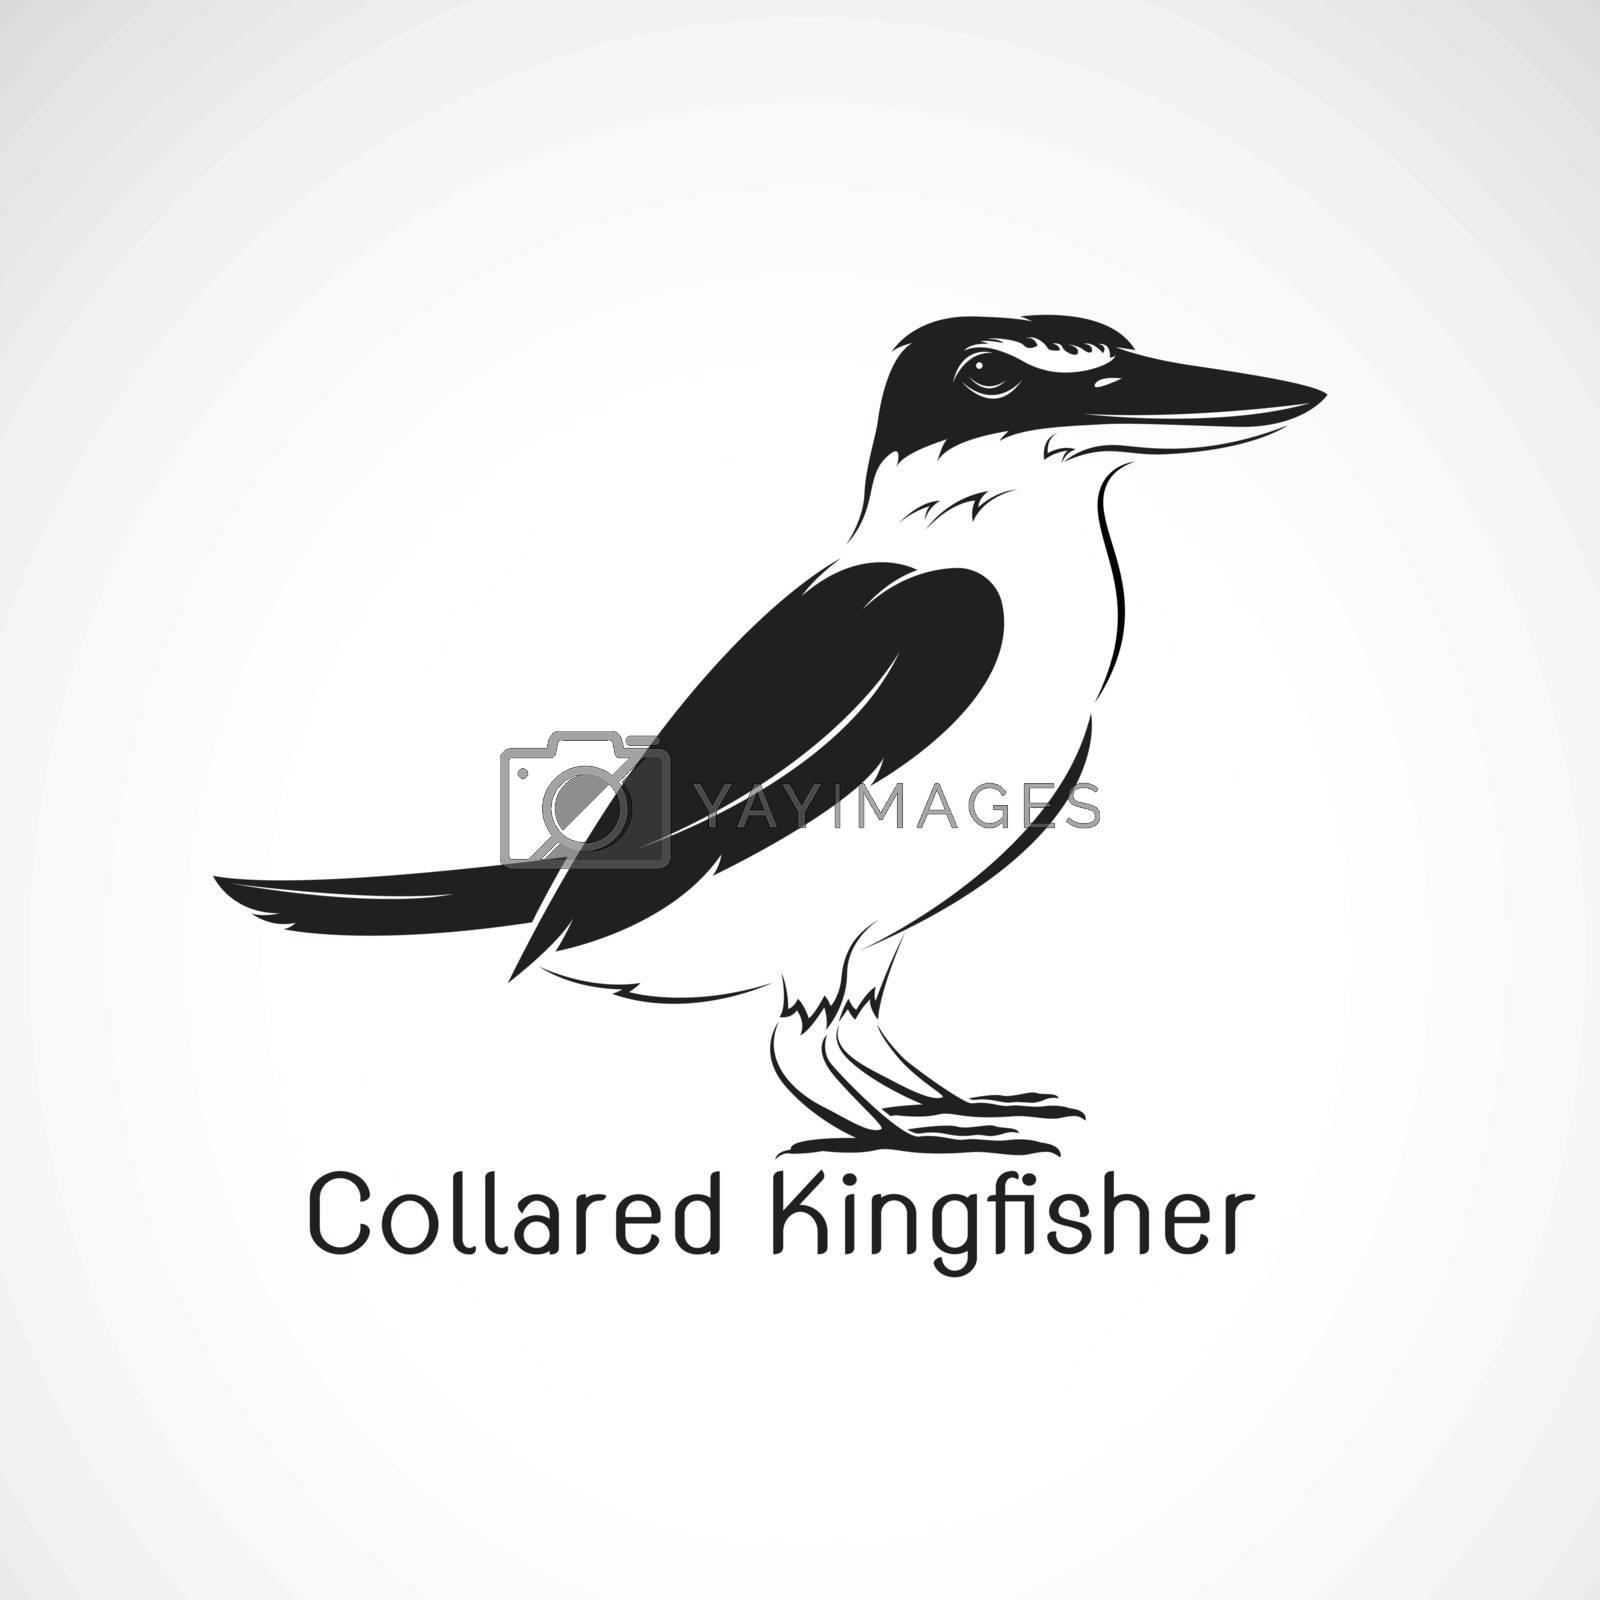 Collared kingfisher(Todiramphus chloris) isolated on white background. Birds. Animals. Easy editable layered vector illustration.